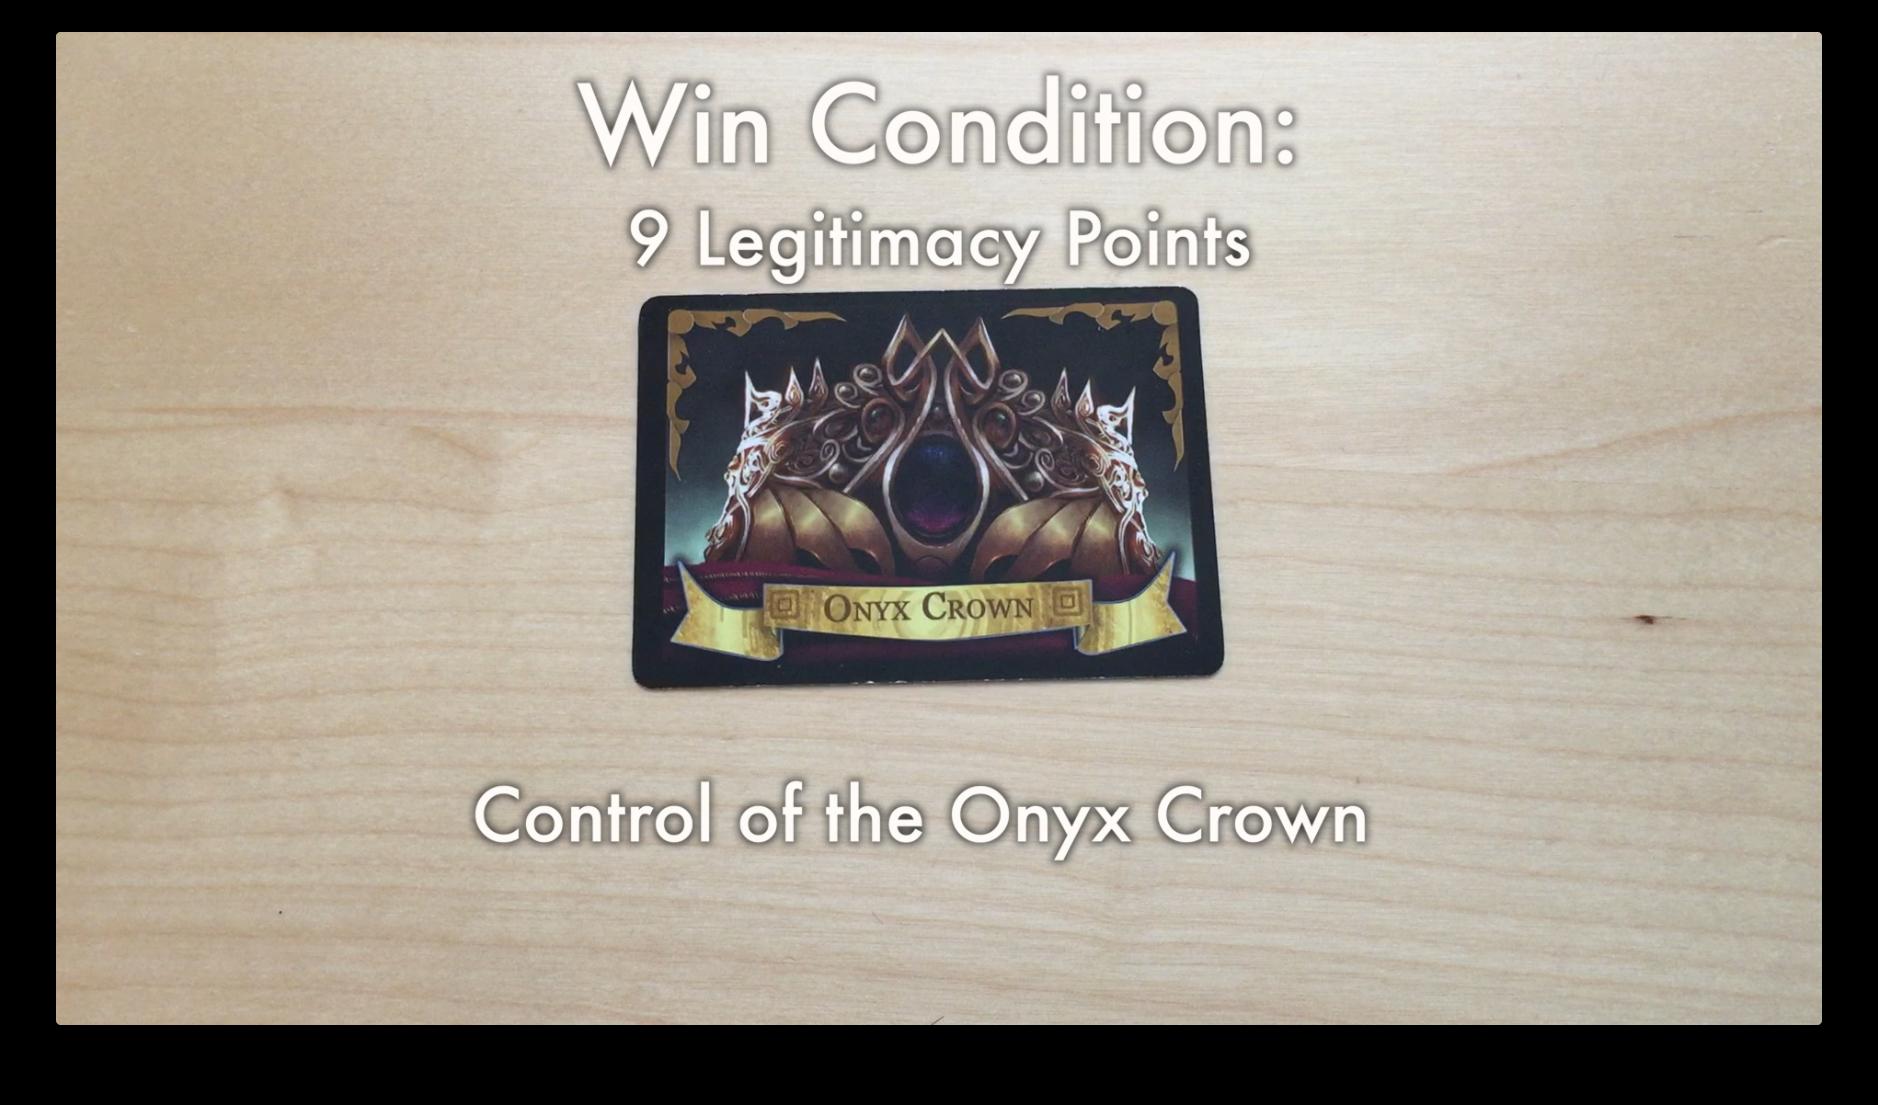 The Win Condition